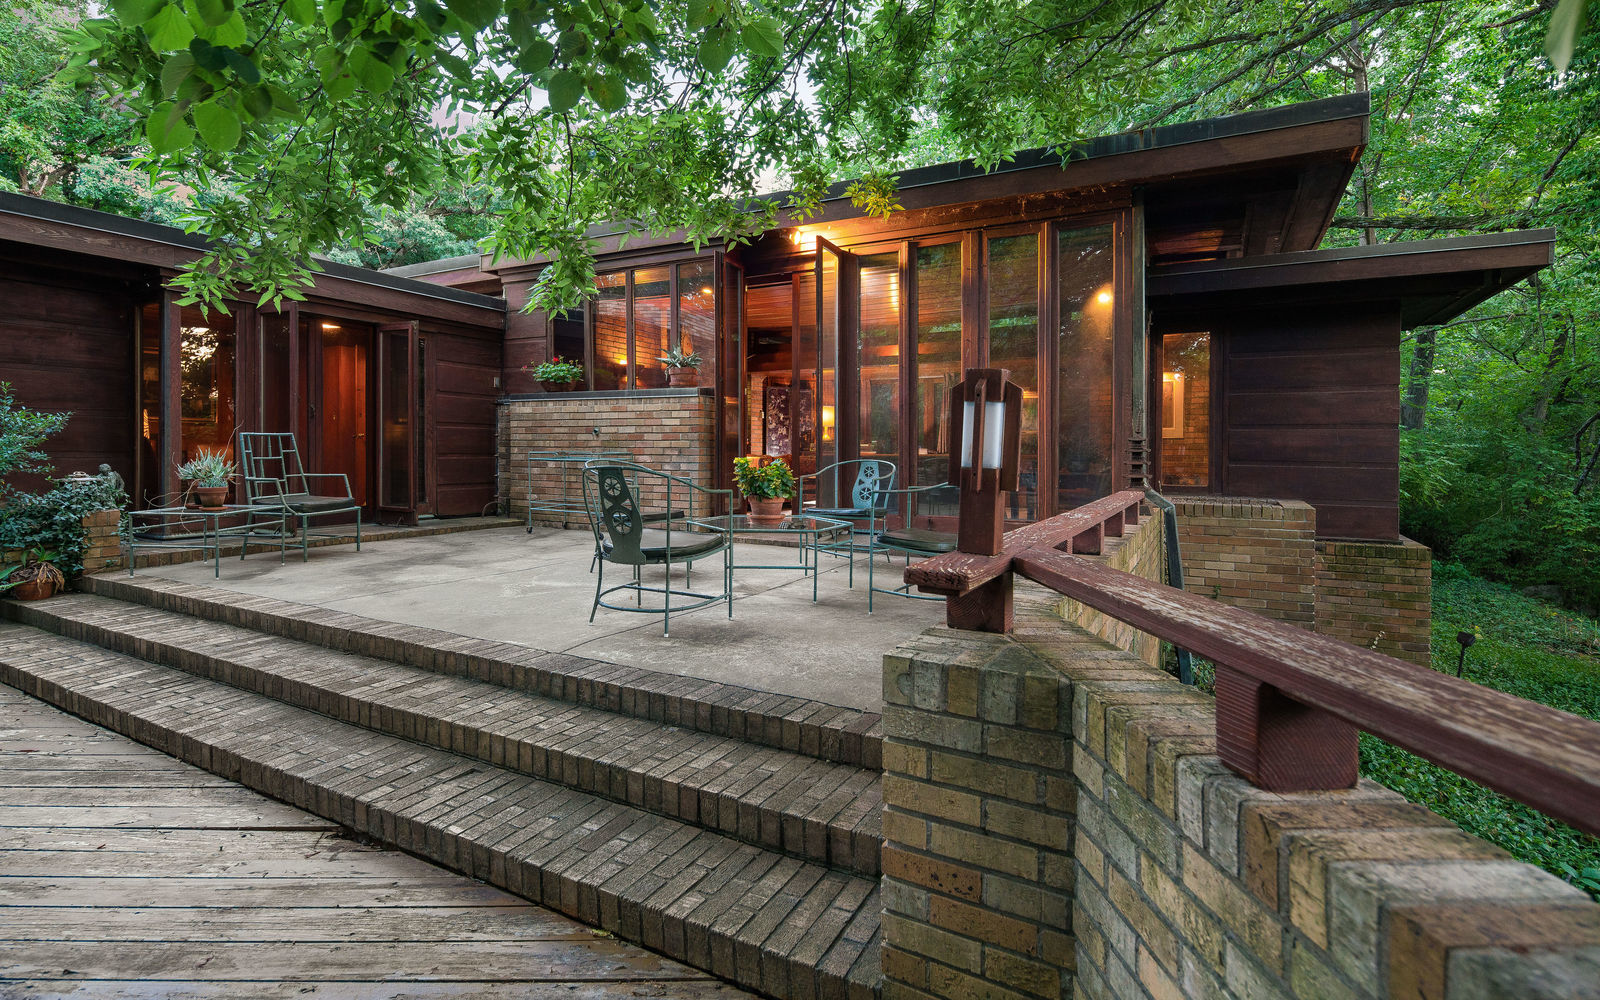 Twilight In Koi Pond >> 3600 Belleview Avenue Kansas City Missouri 64111 | SEVEN IMAGES